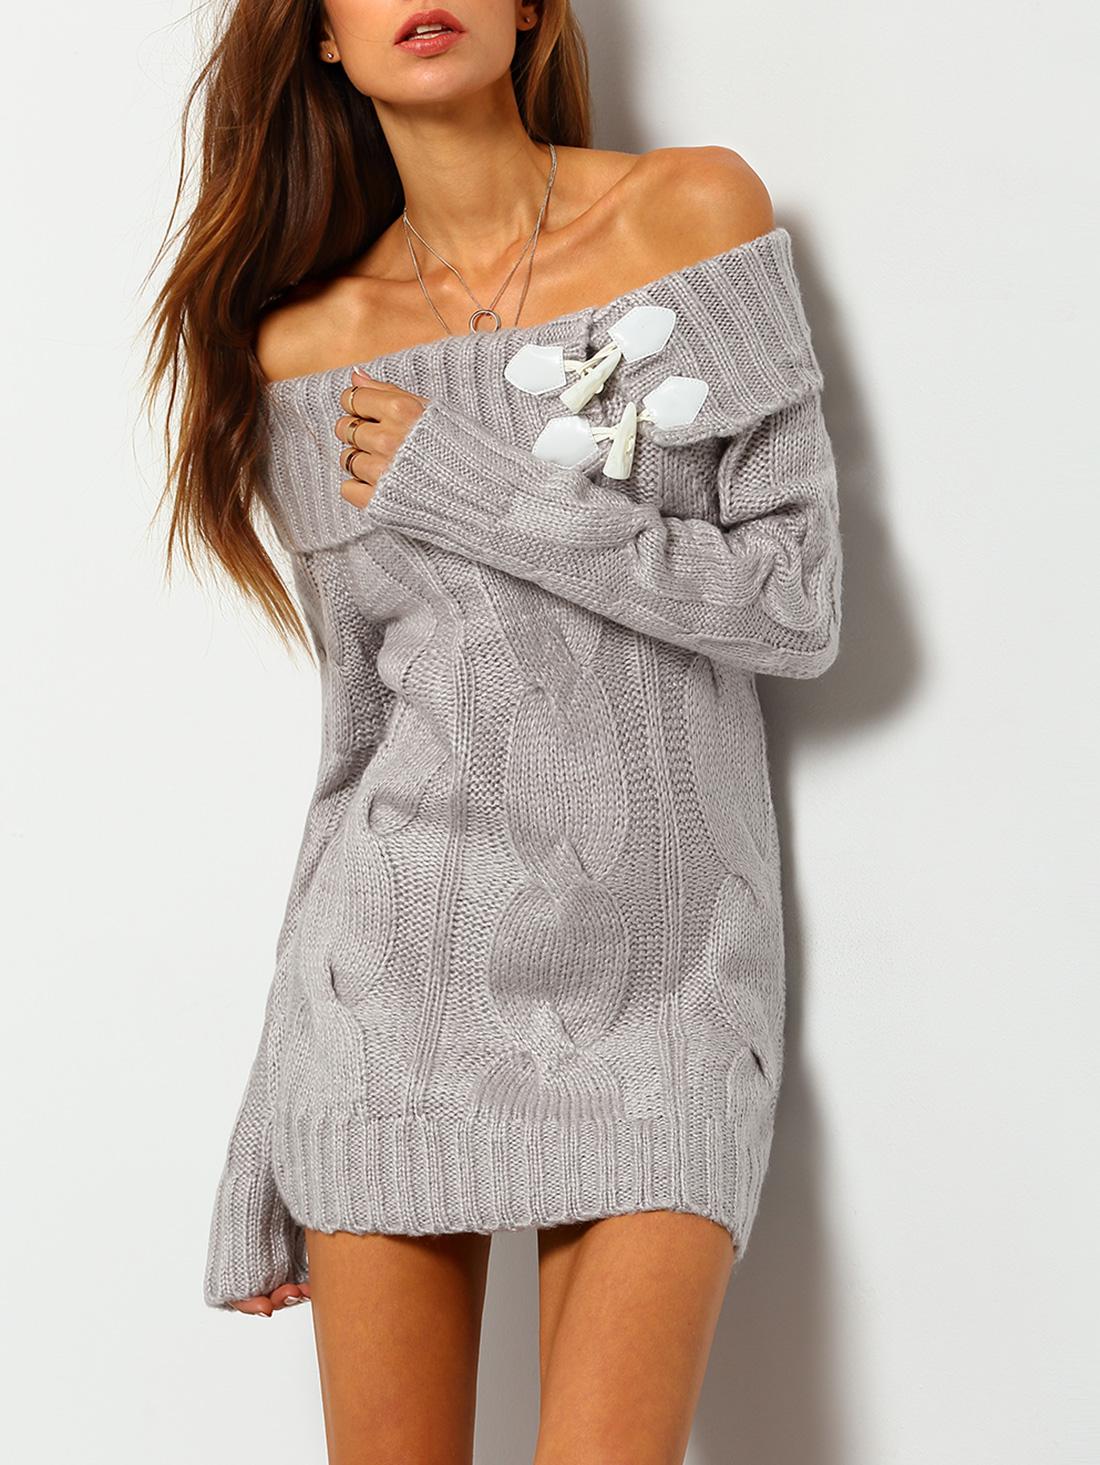 Buckle Off The Shoulder Sweater Dress -SheIn(Sheinside)